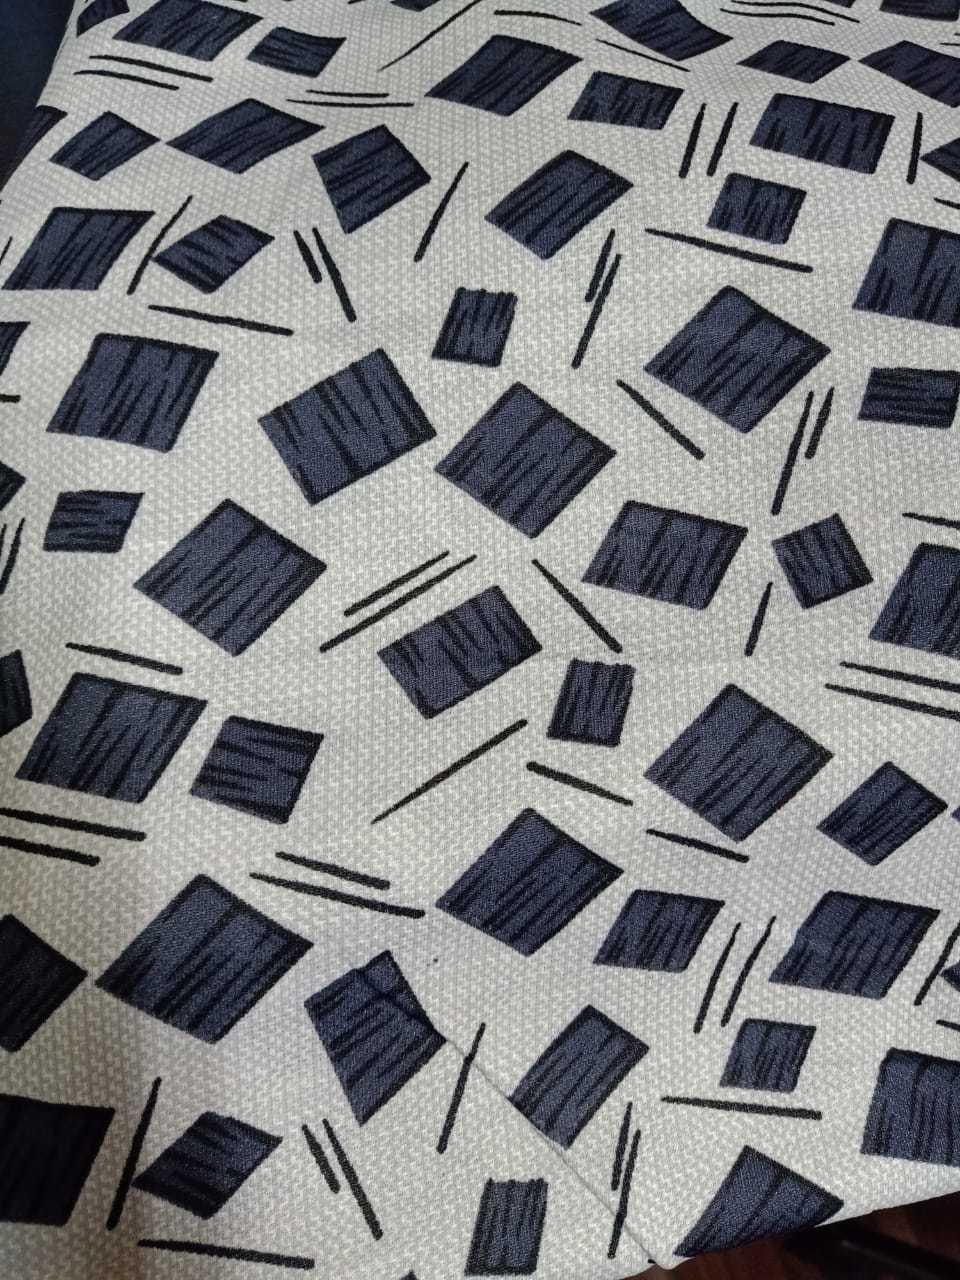 Soft Matty Printed Fabric